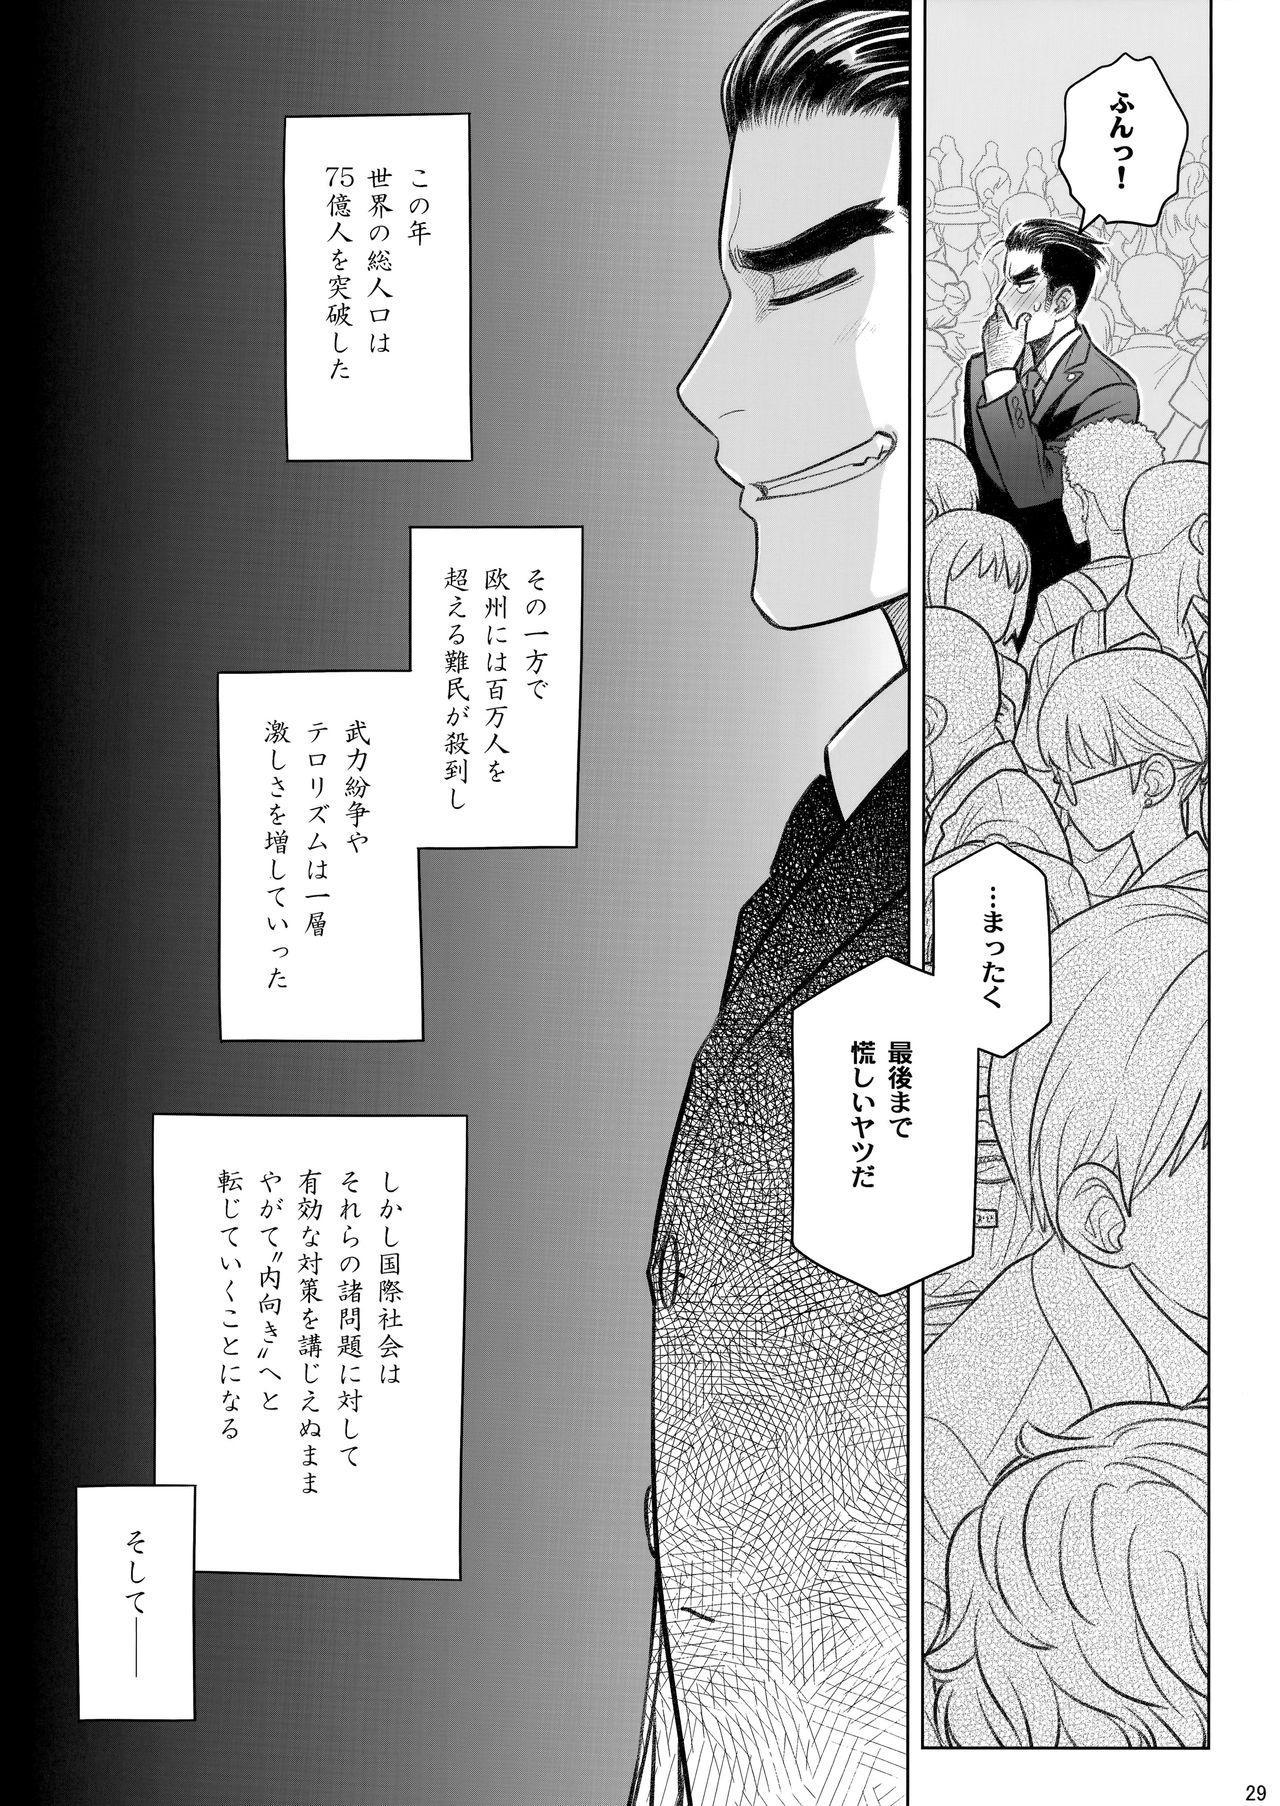 Sorako no Tabi 8 28